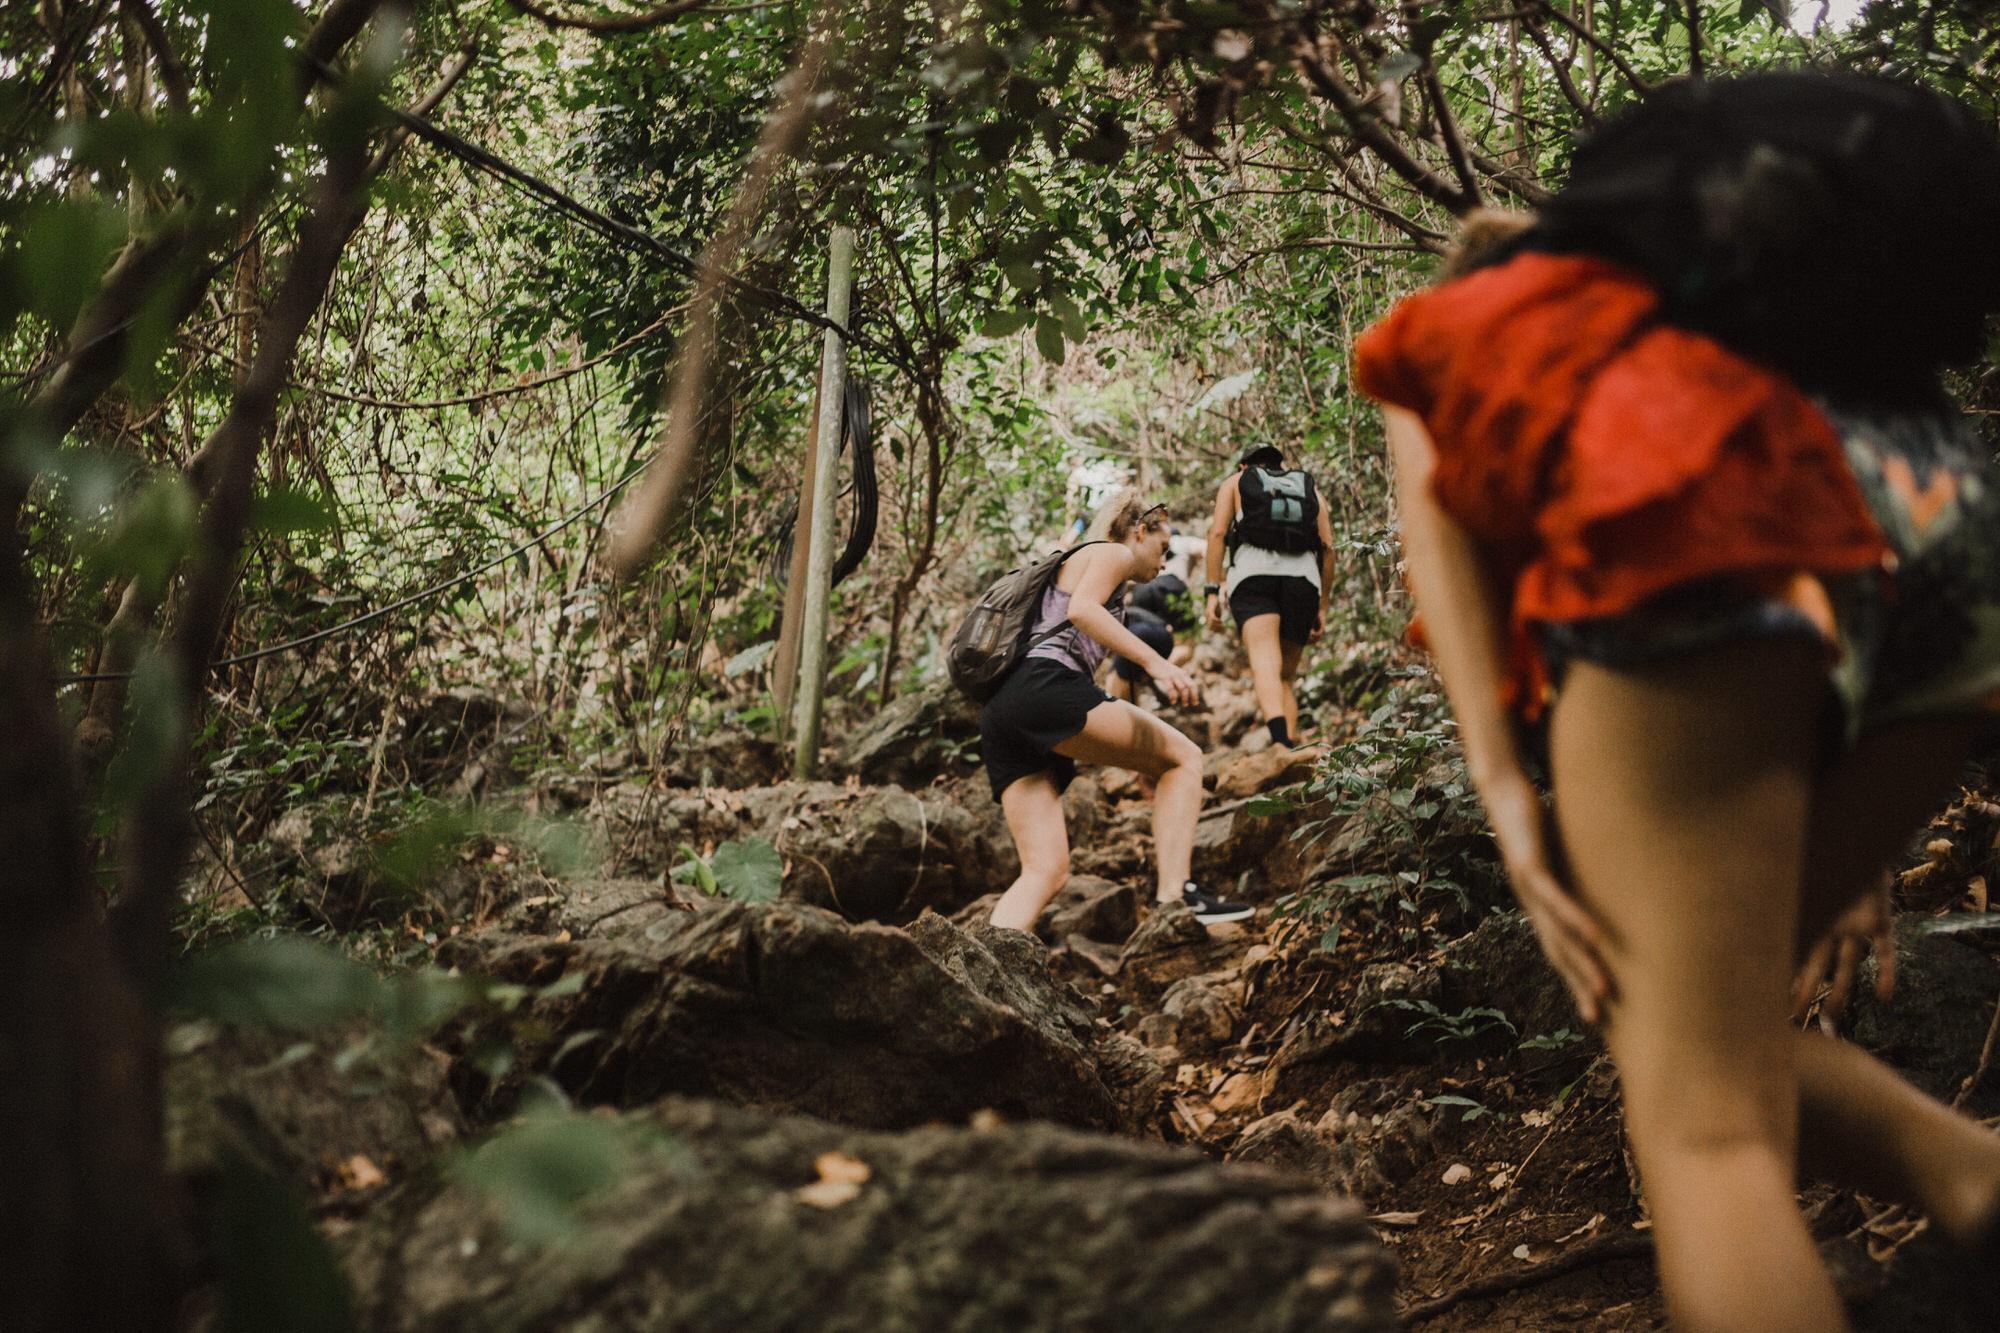 hikinginvietnamgirl2.jpg